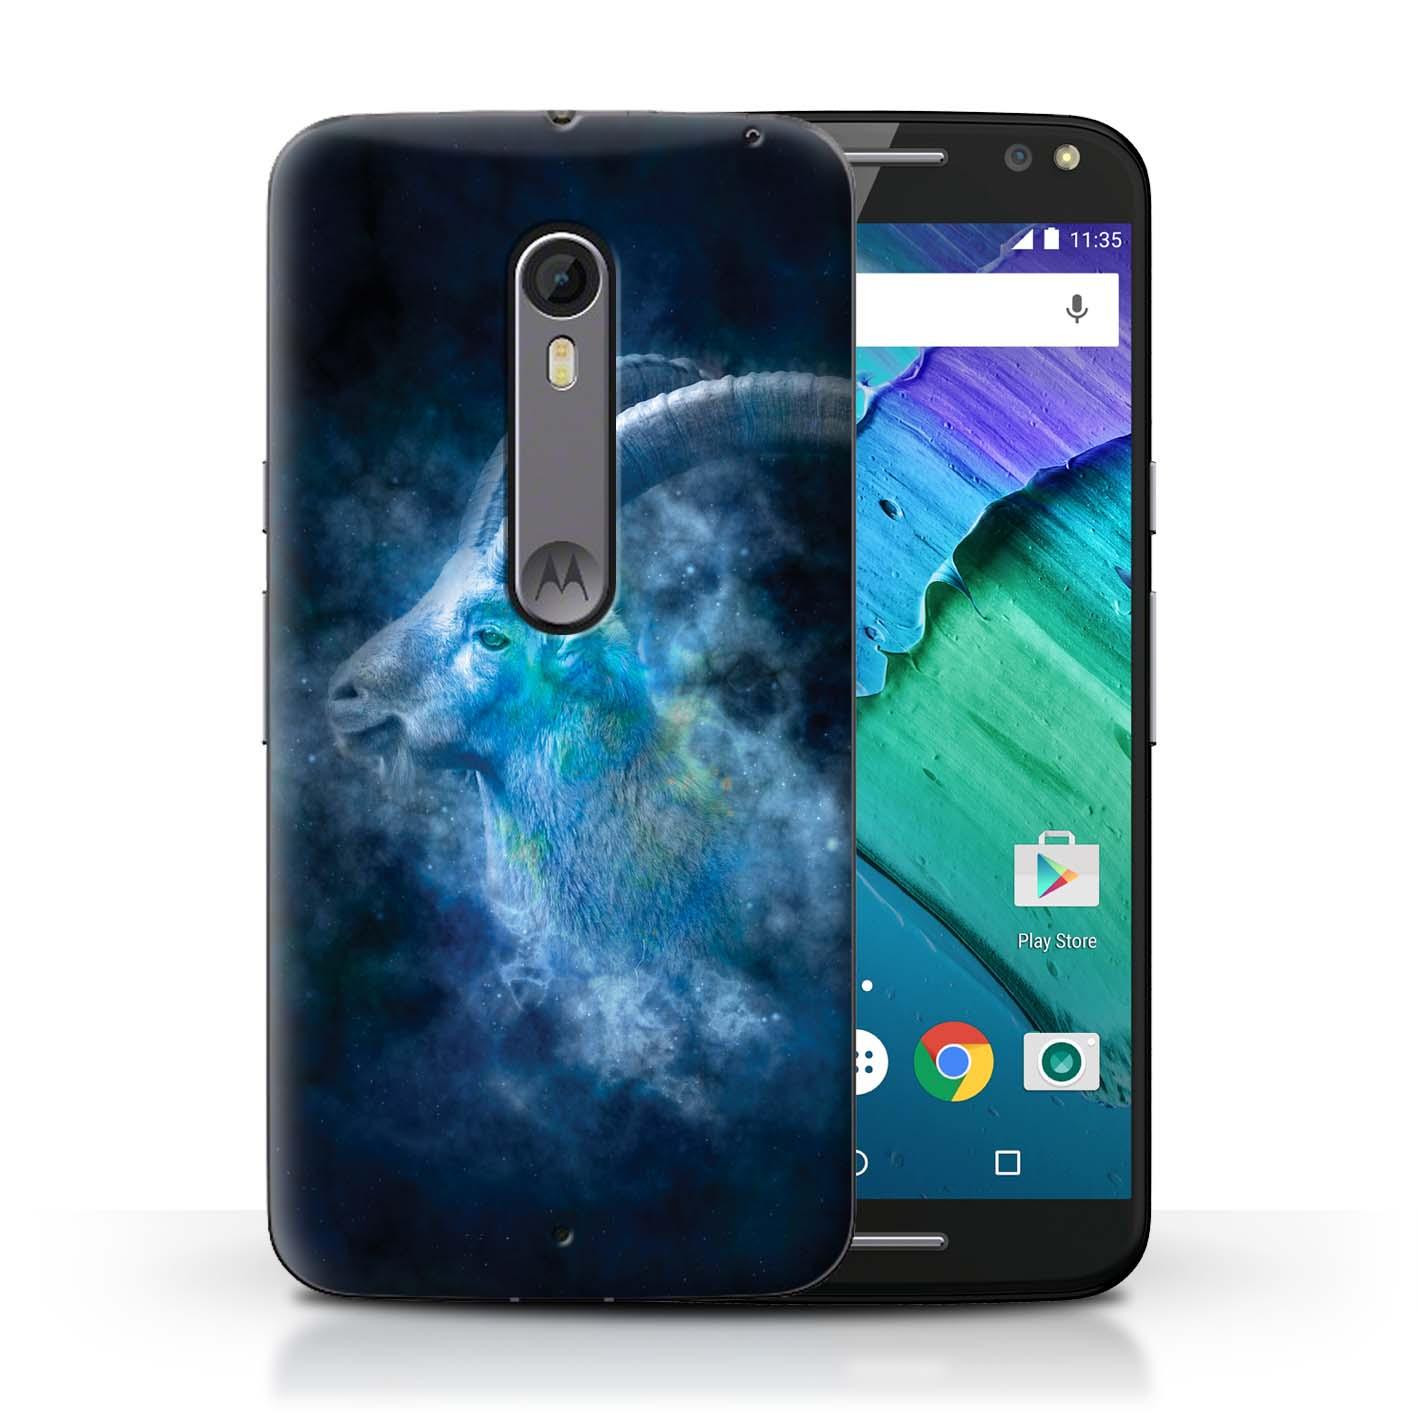 Coque-Etui-Housse-de-Stuff4-pour-Motorola-Moto-X-Style-Zodiaque-Etoile-Signe